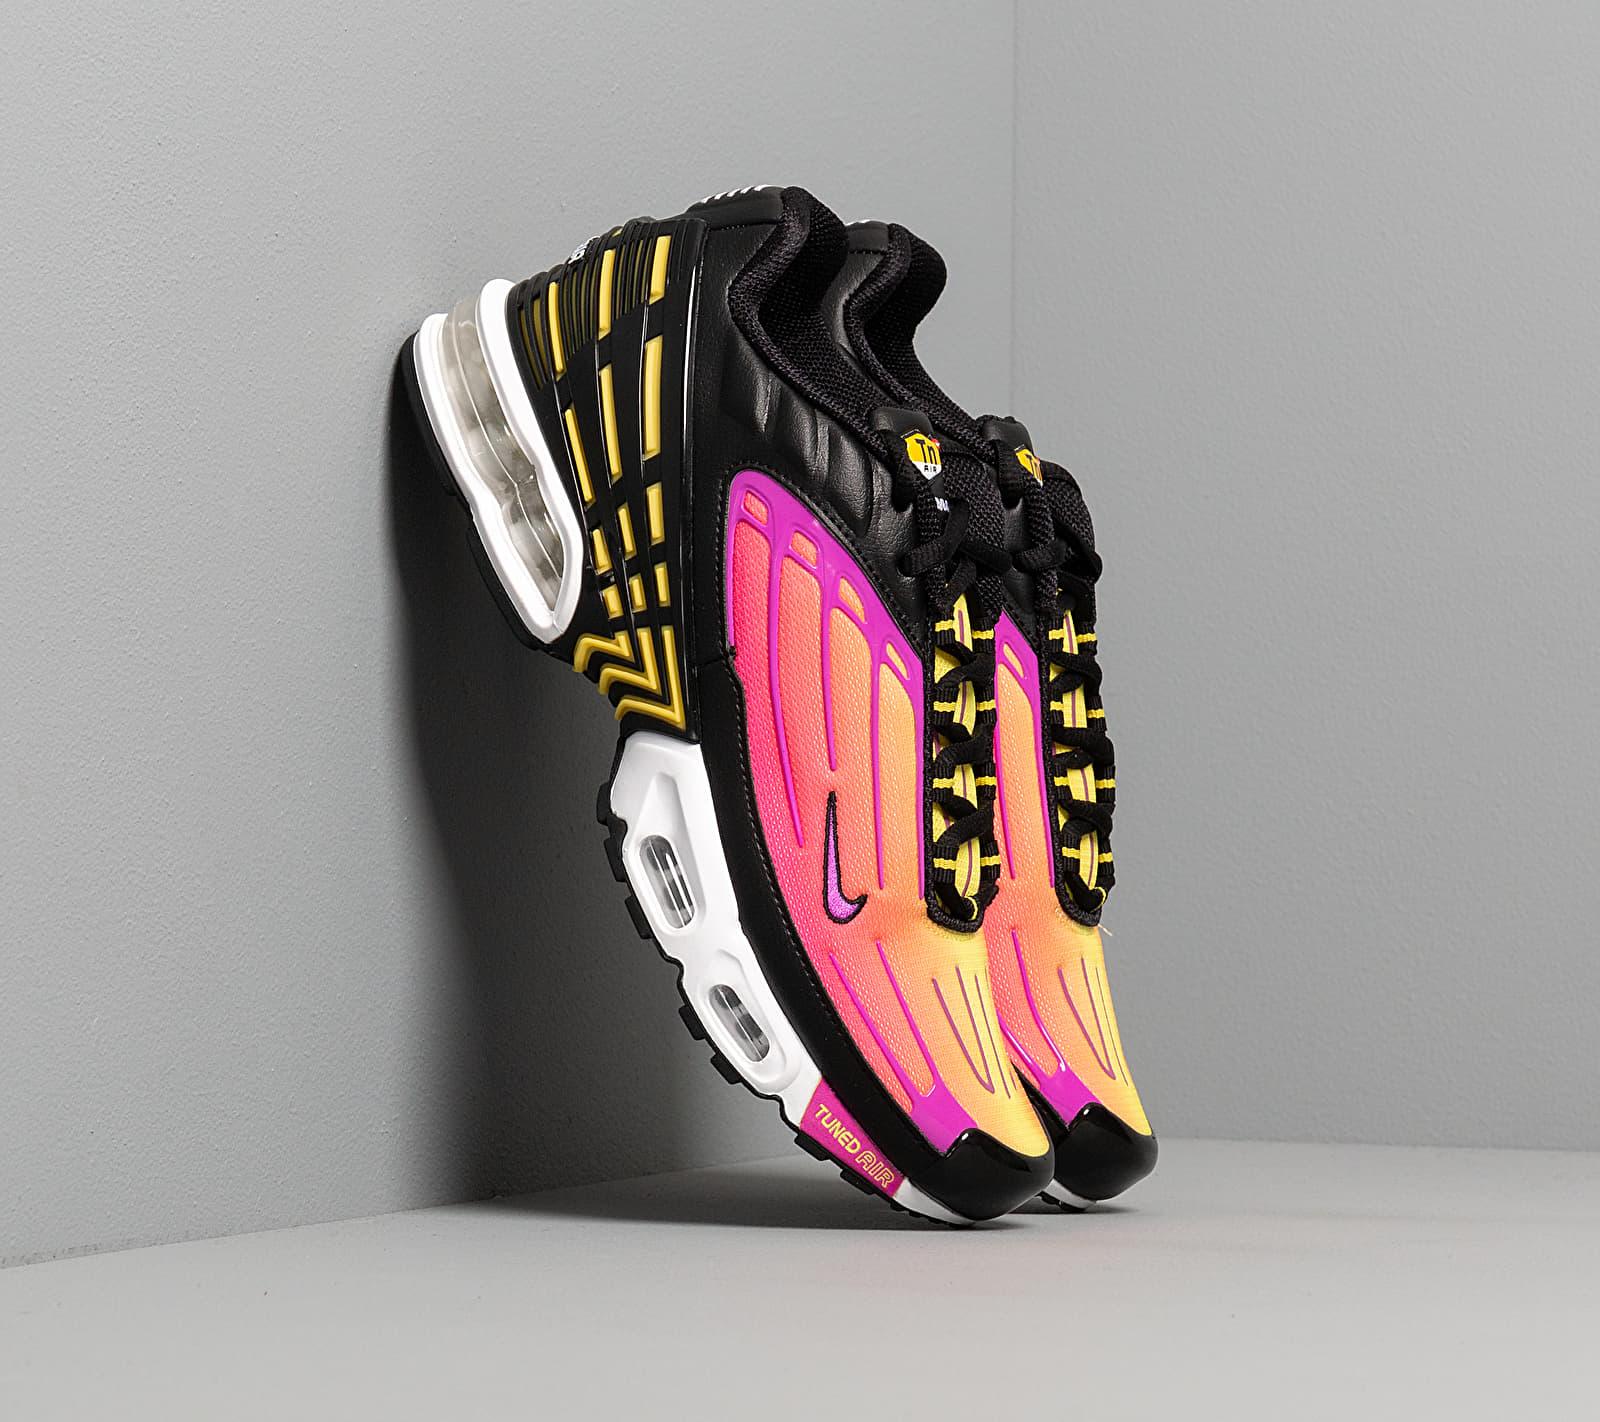 Nike Air Max Plus III Black/ Hyper Violet-Dynamic Yellow EUR 43